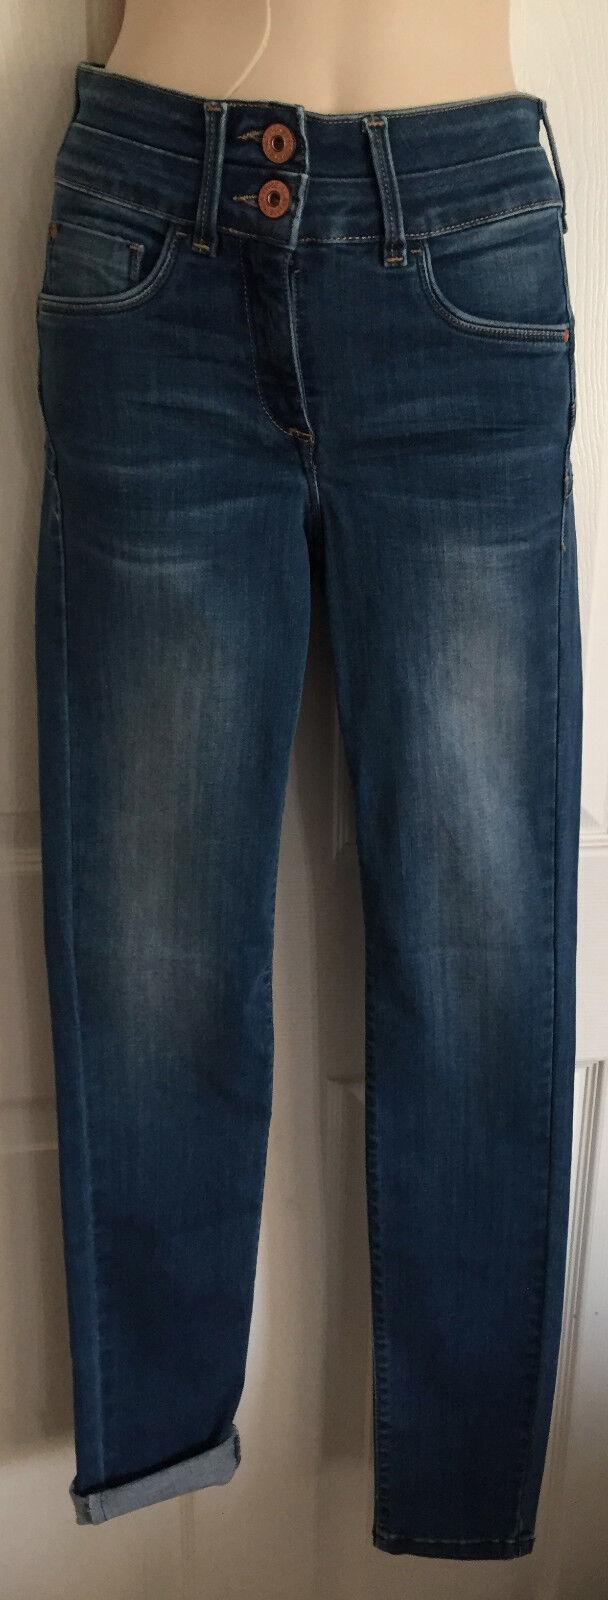 Next Next Next  Lift, Slim And Shape, SKINNY Indigo Jeans  8L , 8XL , 8T ,10T, 6293ba